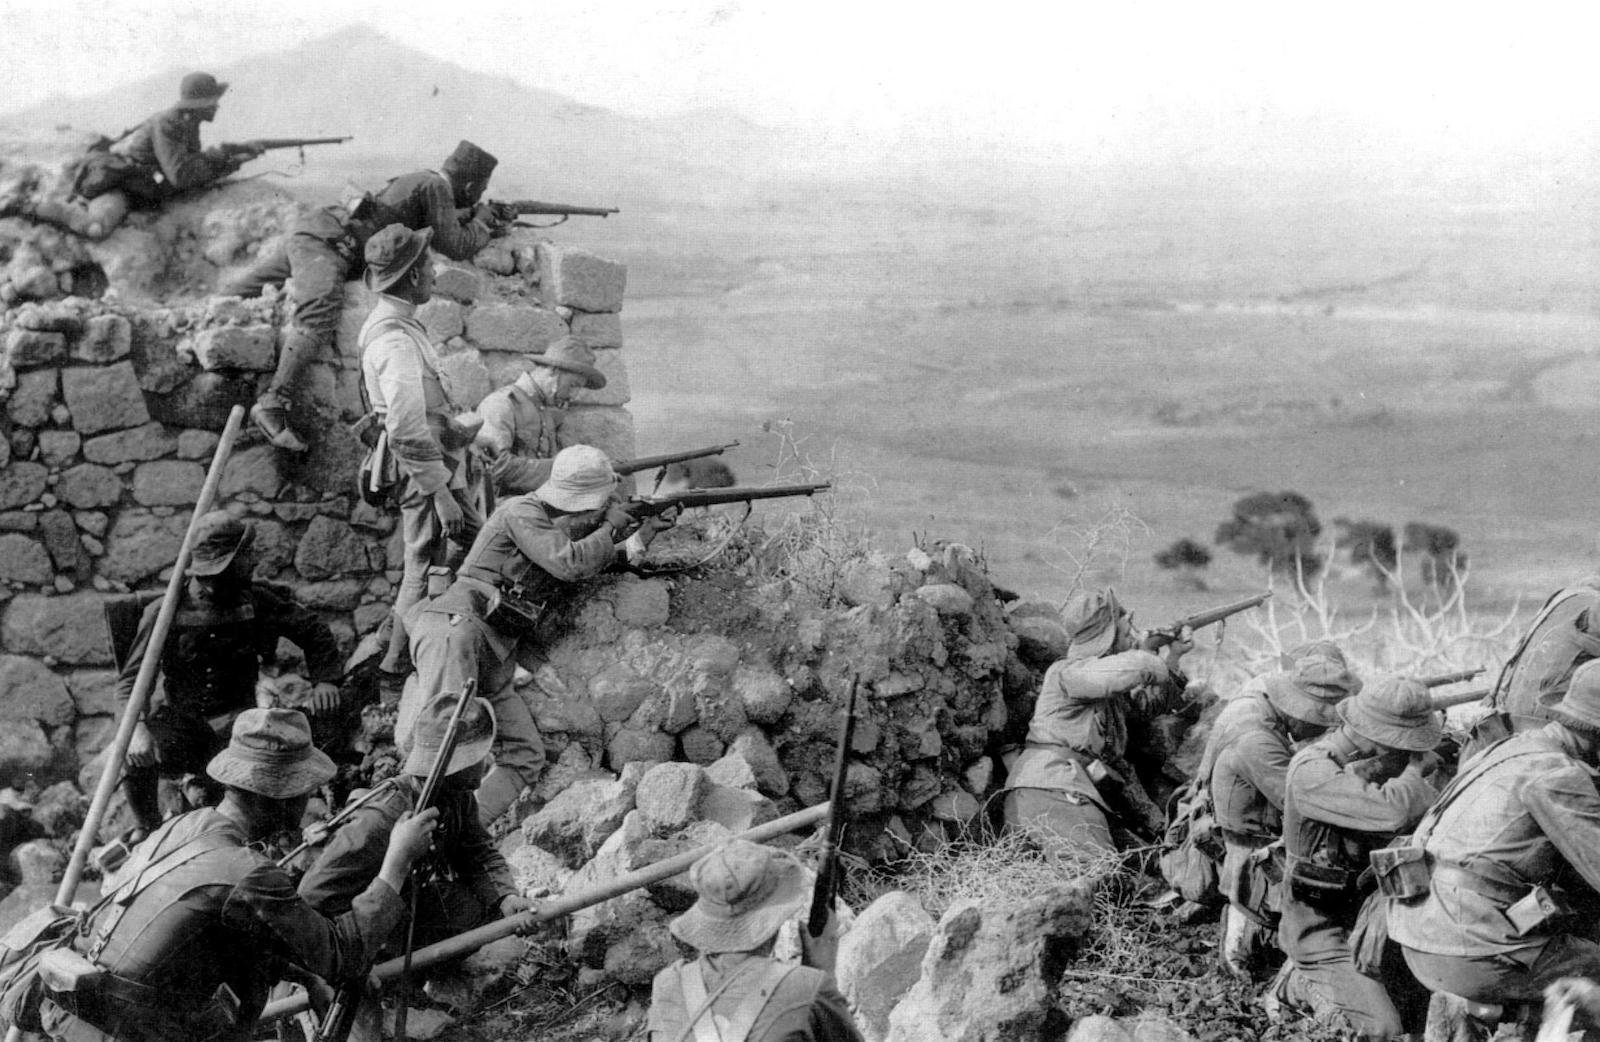 Guerra del Rif desfiladero de Hámara capitán Arredondo